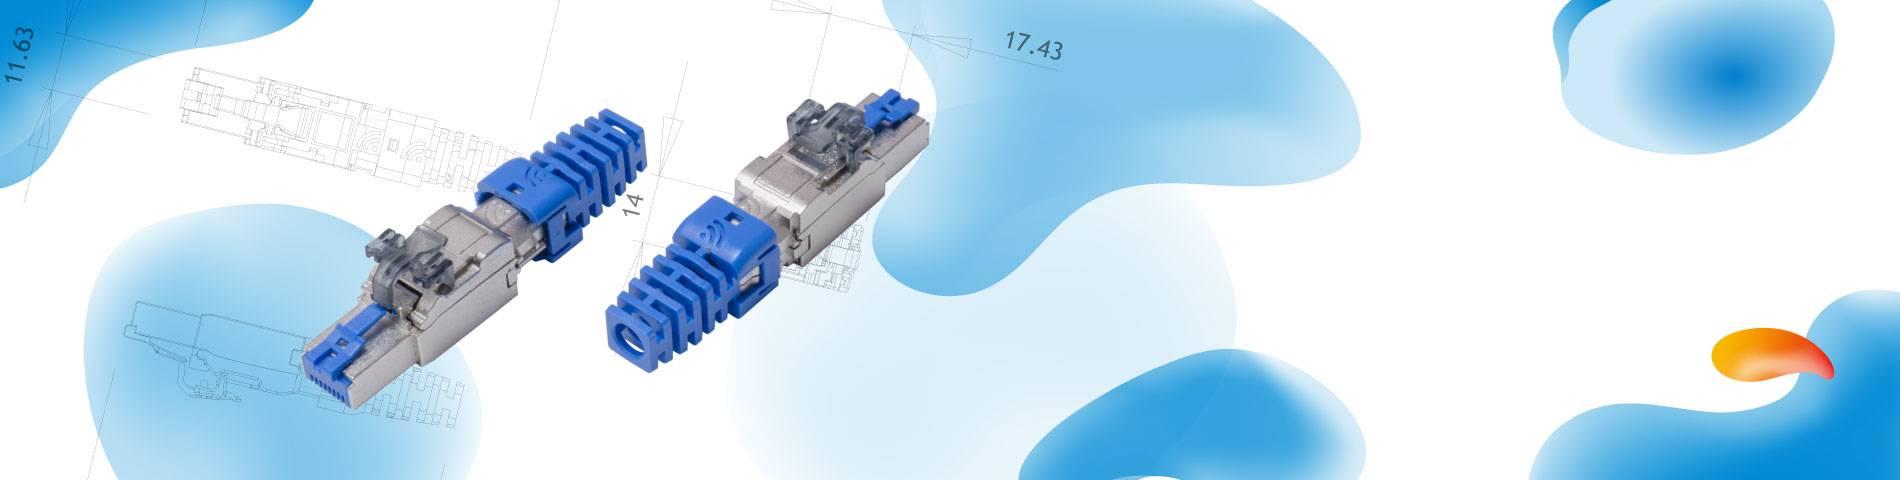 HCI    Enchufe de terminación de campo    ISO / IEC Cat6A PoE +